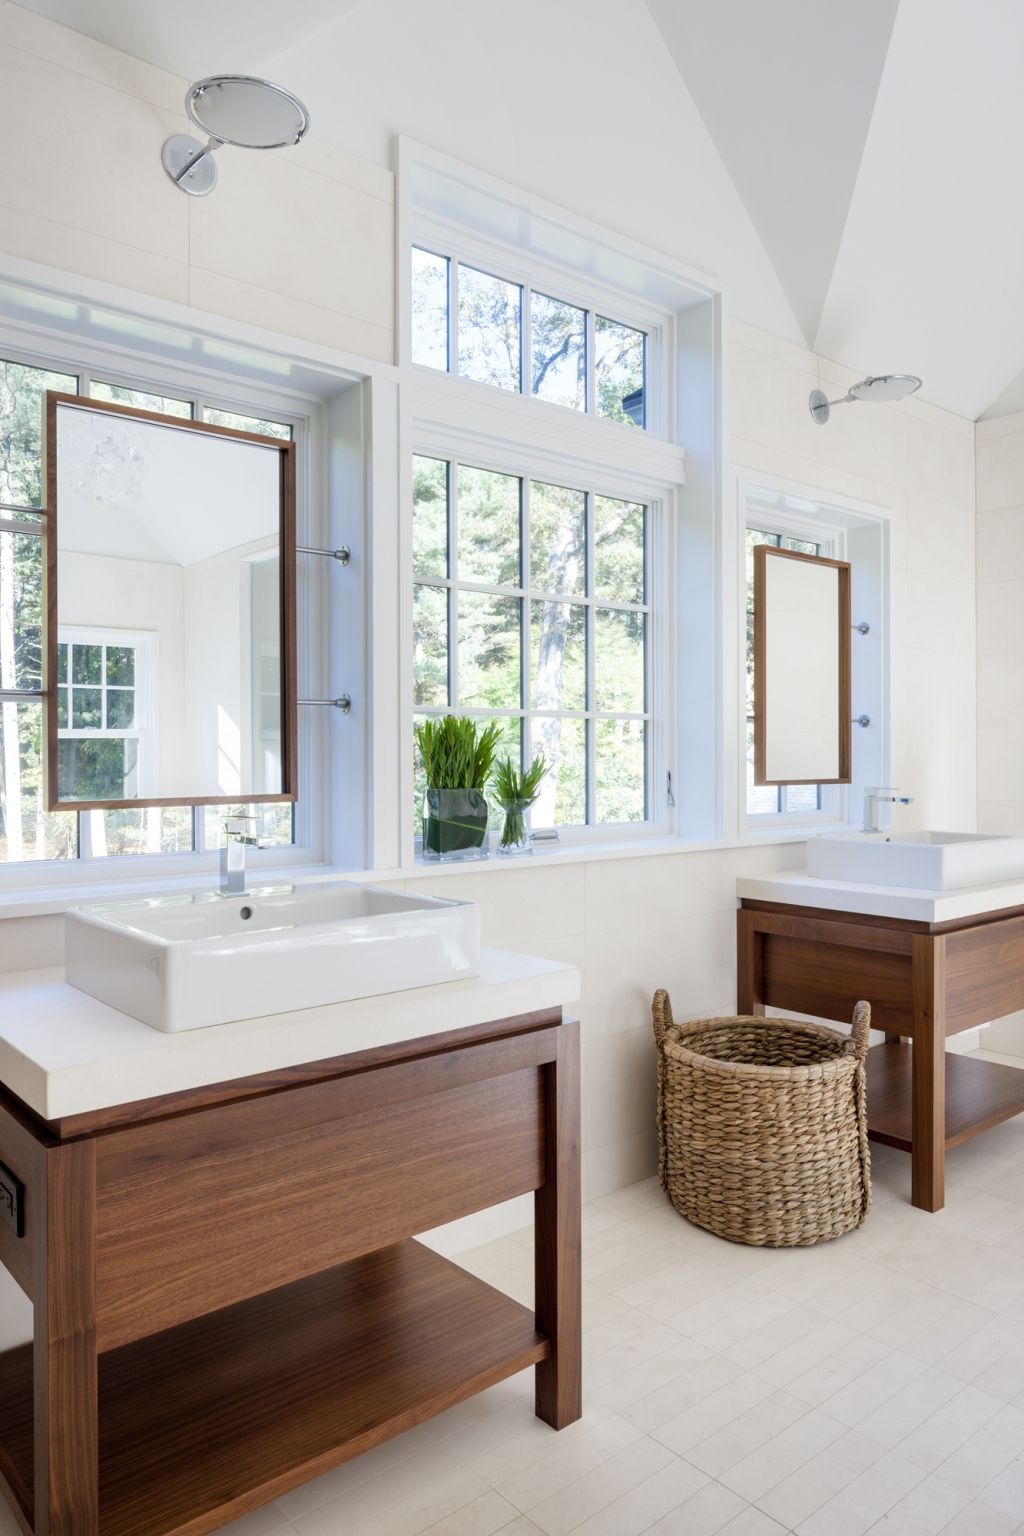 Window house design ideas  lda architecture and interiors  remodelación  pinterest